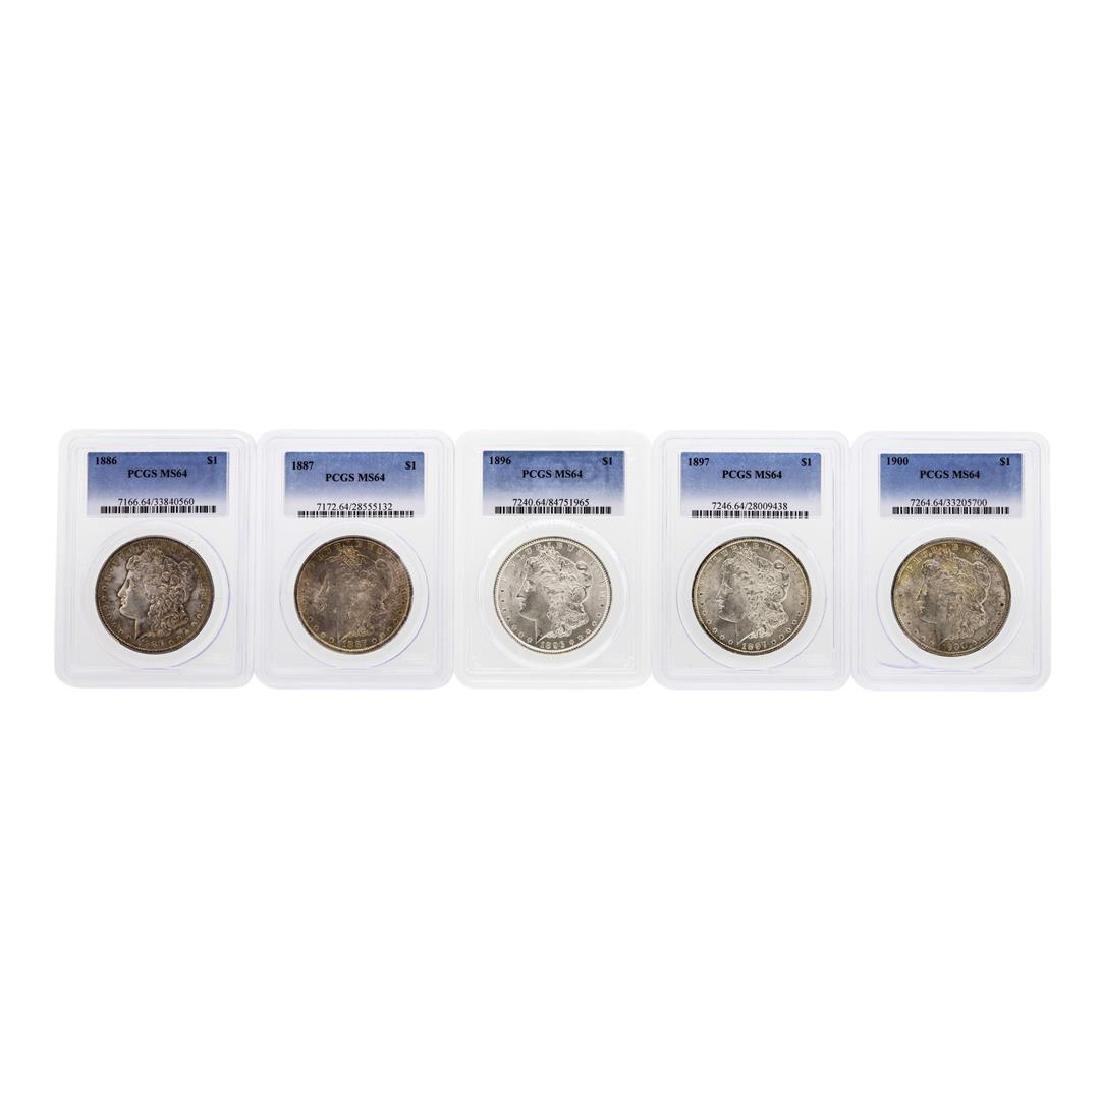 Lot of (5) Assorted Philadelphia Mint $1 Morgan Silver